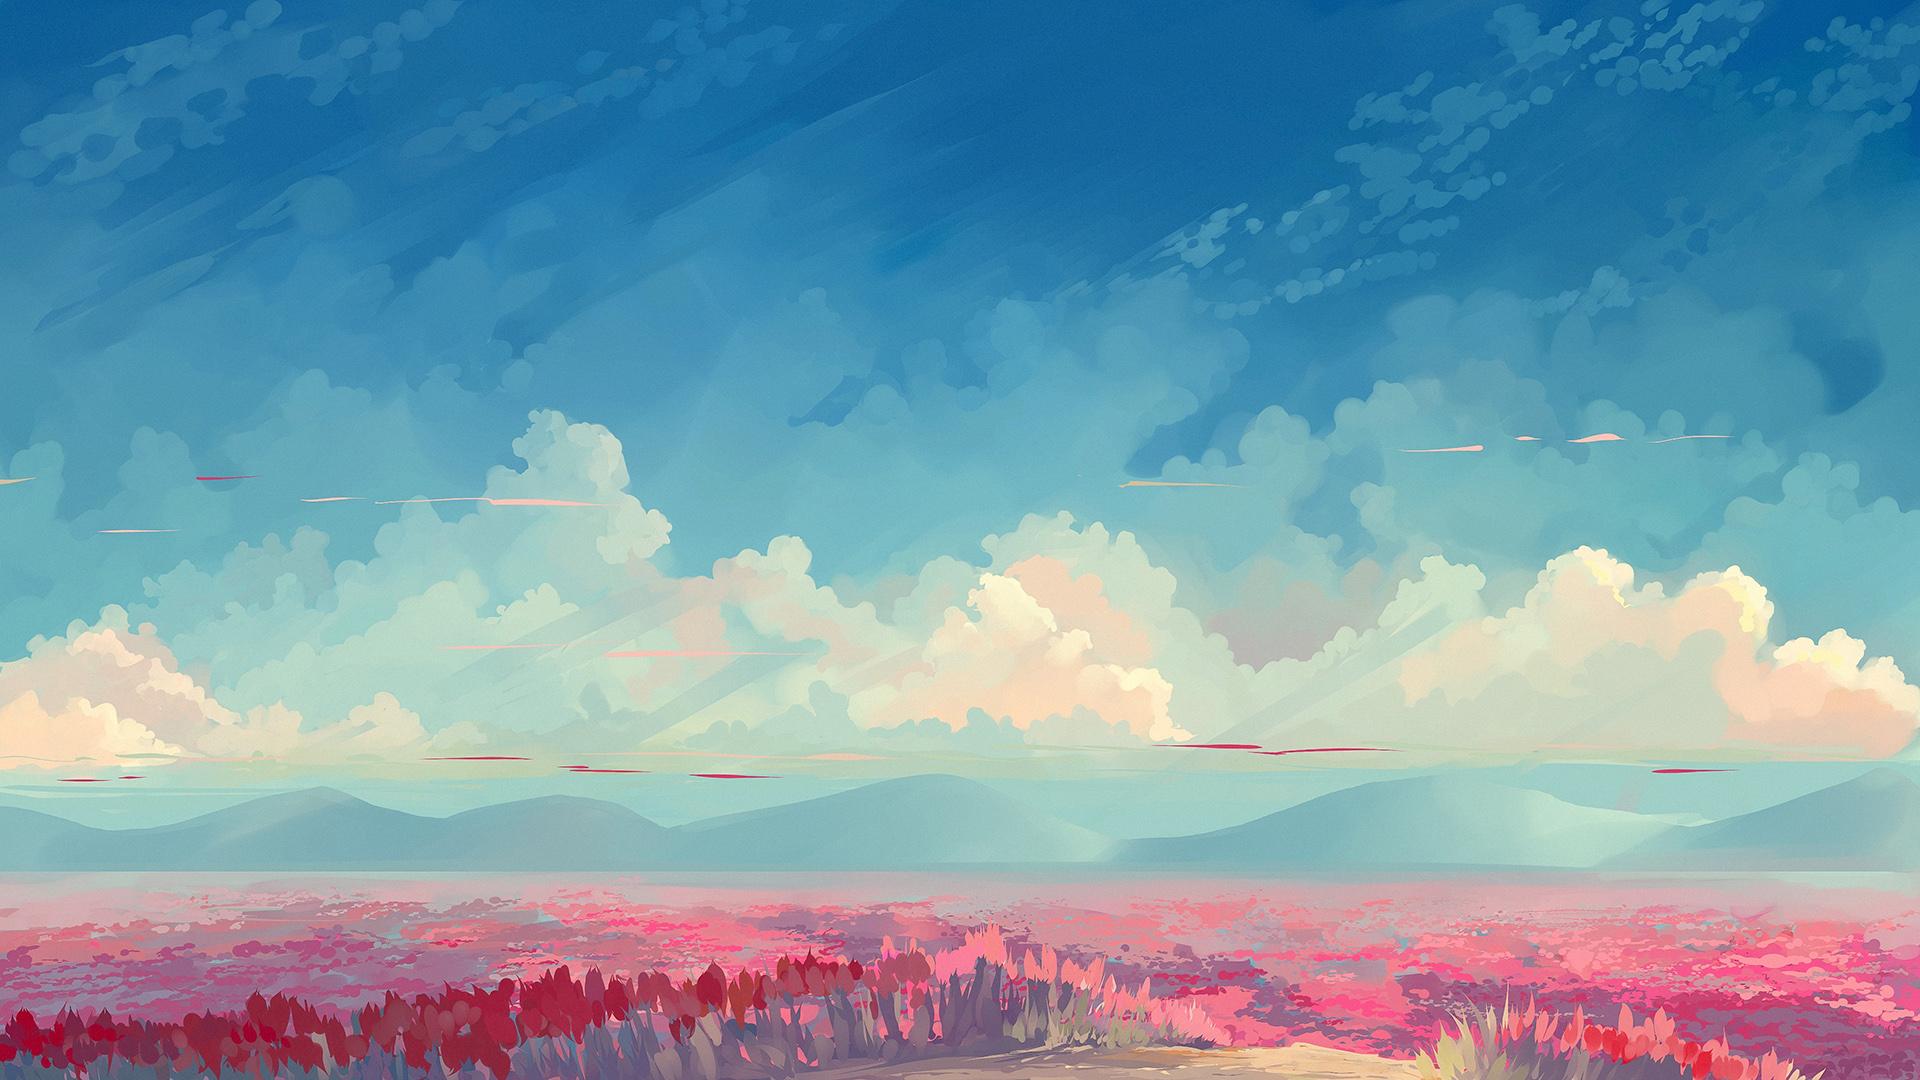 Wallpaper Sky Blue Clouds Flowers Painting 1920x1080 Axela 1754289 Hd Wallpapers Wallhere